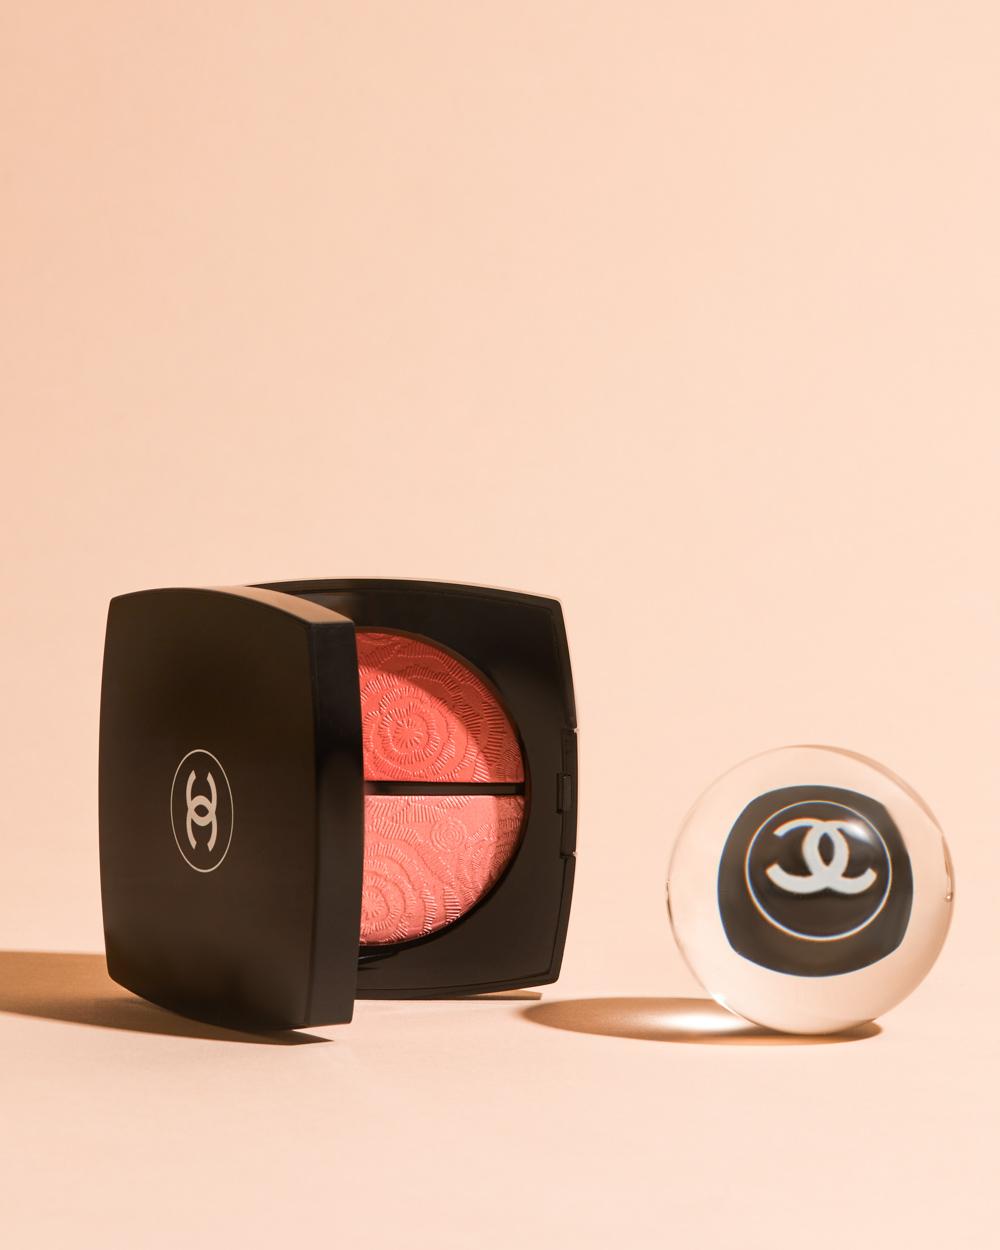 Chanel Spring Summer 21 beauty essentials